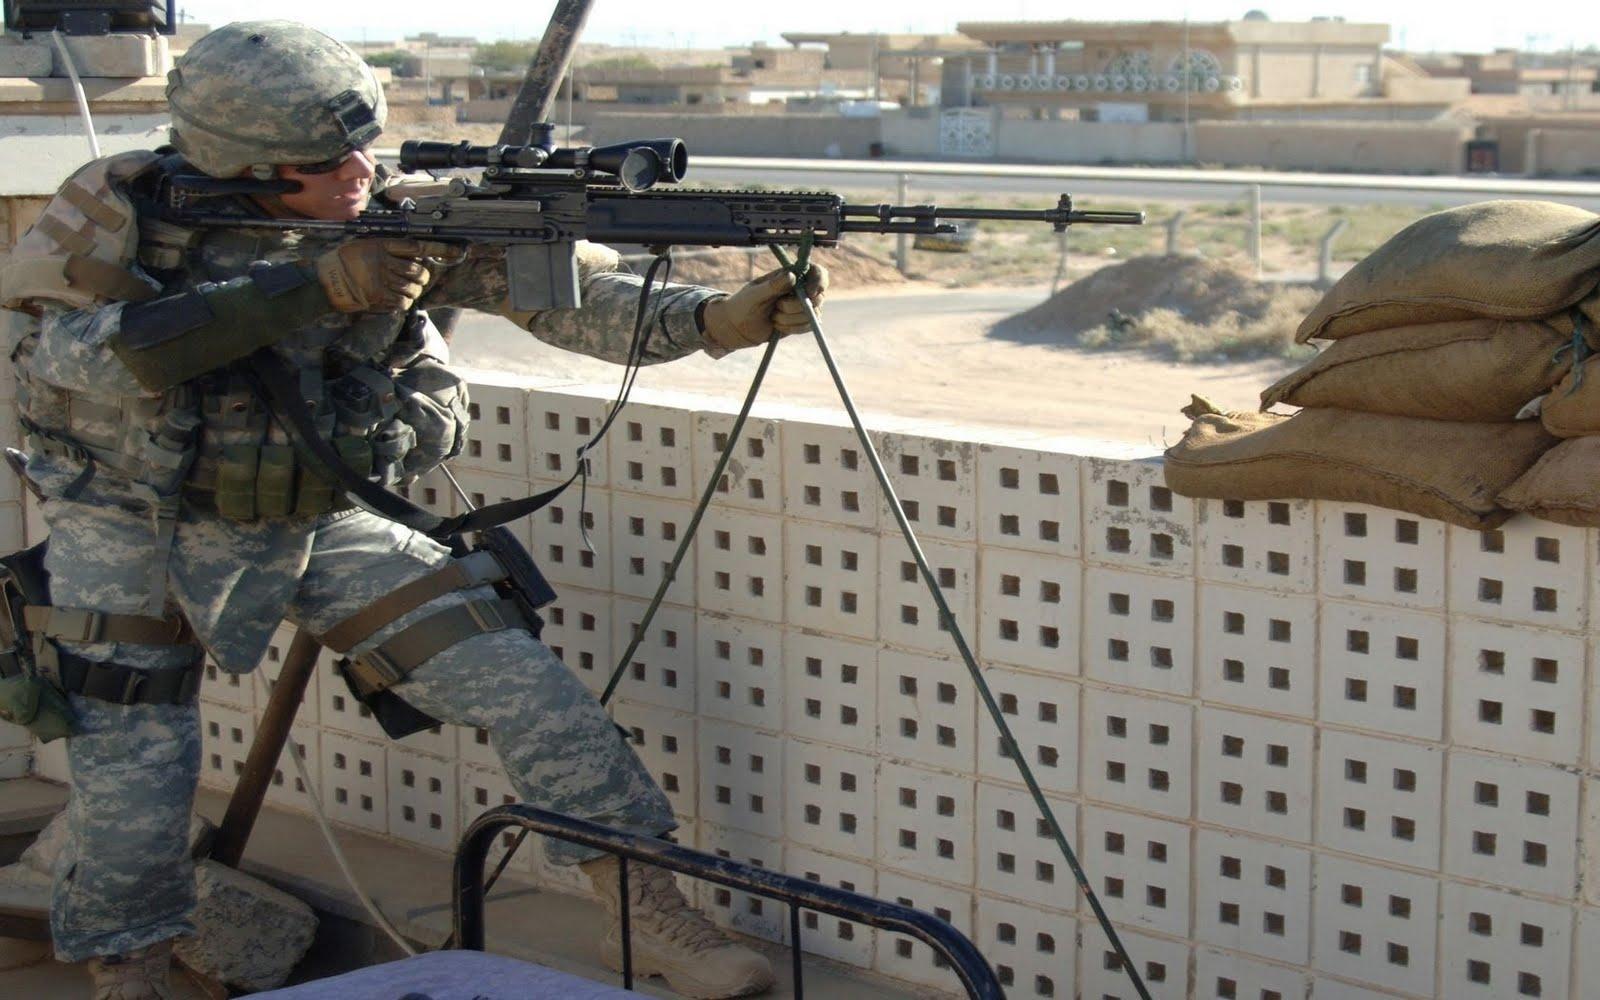 http://4.bp.blogspot.com/-jrJ8OyHwjD8/TrYhSgOZ9pI/AAAAAAAABw8/cNDMhFXuC98/s1600/Army-Military-Man-High-Resolution-Wallpapers.stillmaza.com-1.jpg